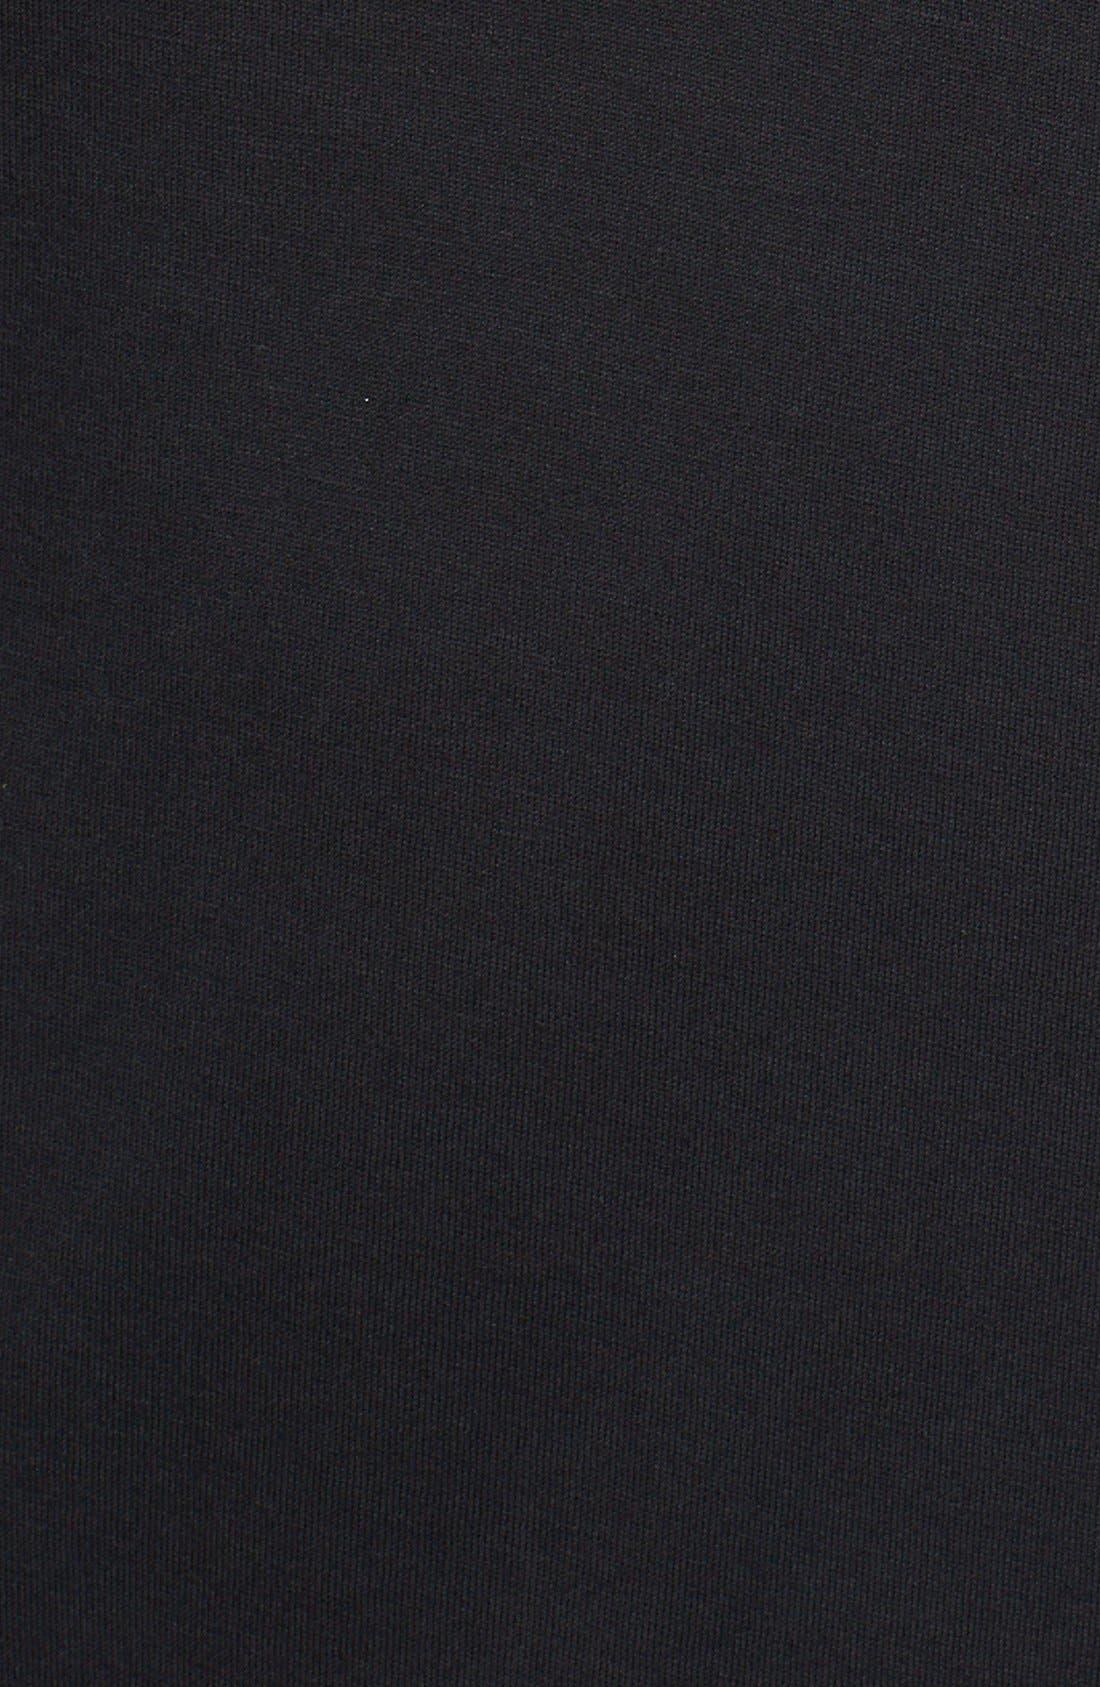 Alternate Image 3  - Ralph Lauren Black Label Pima Cotton Pocket Crewneck T-Shirt